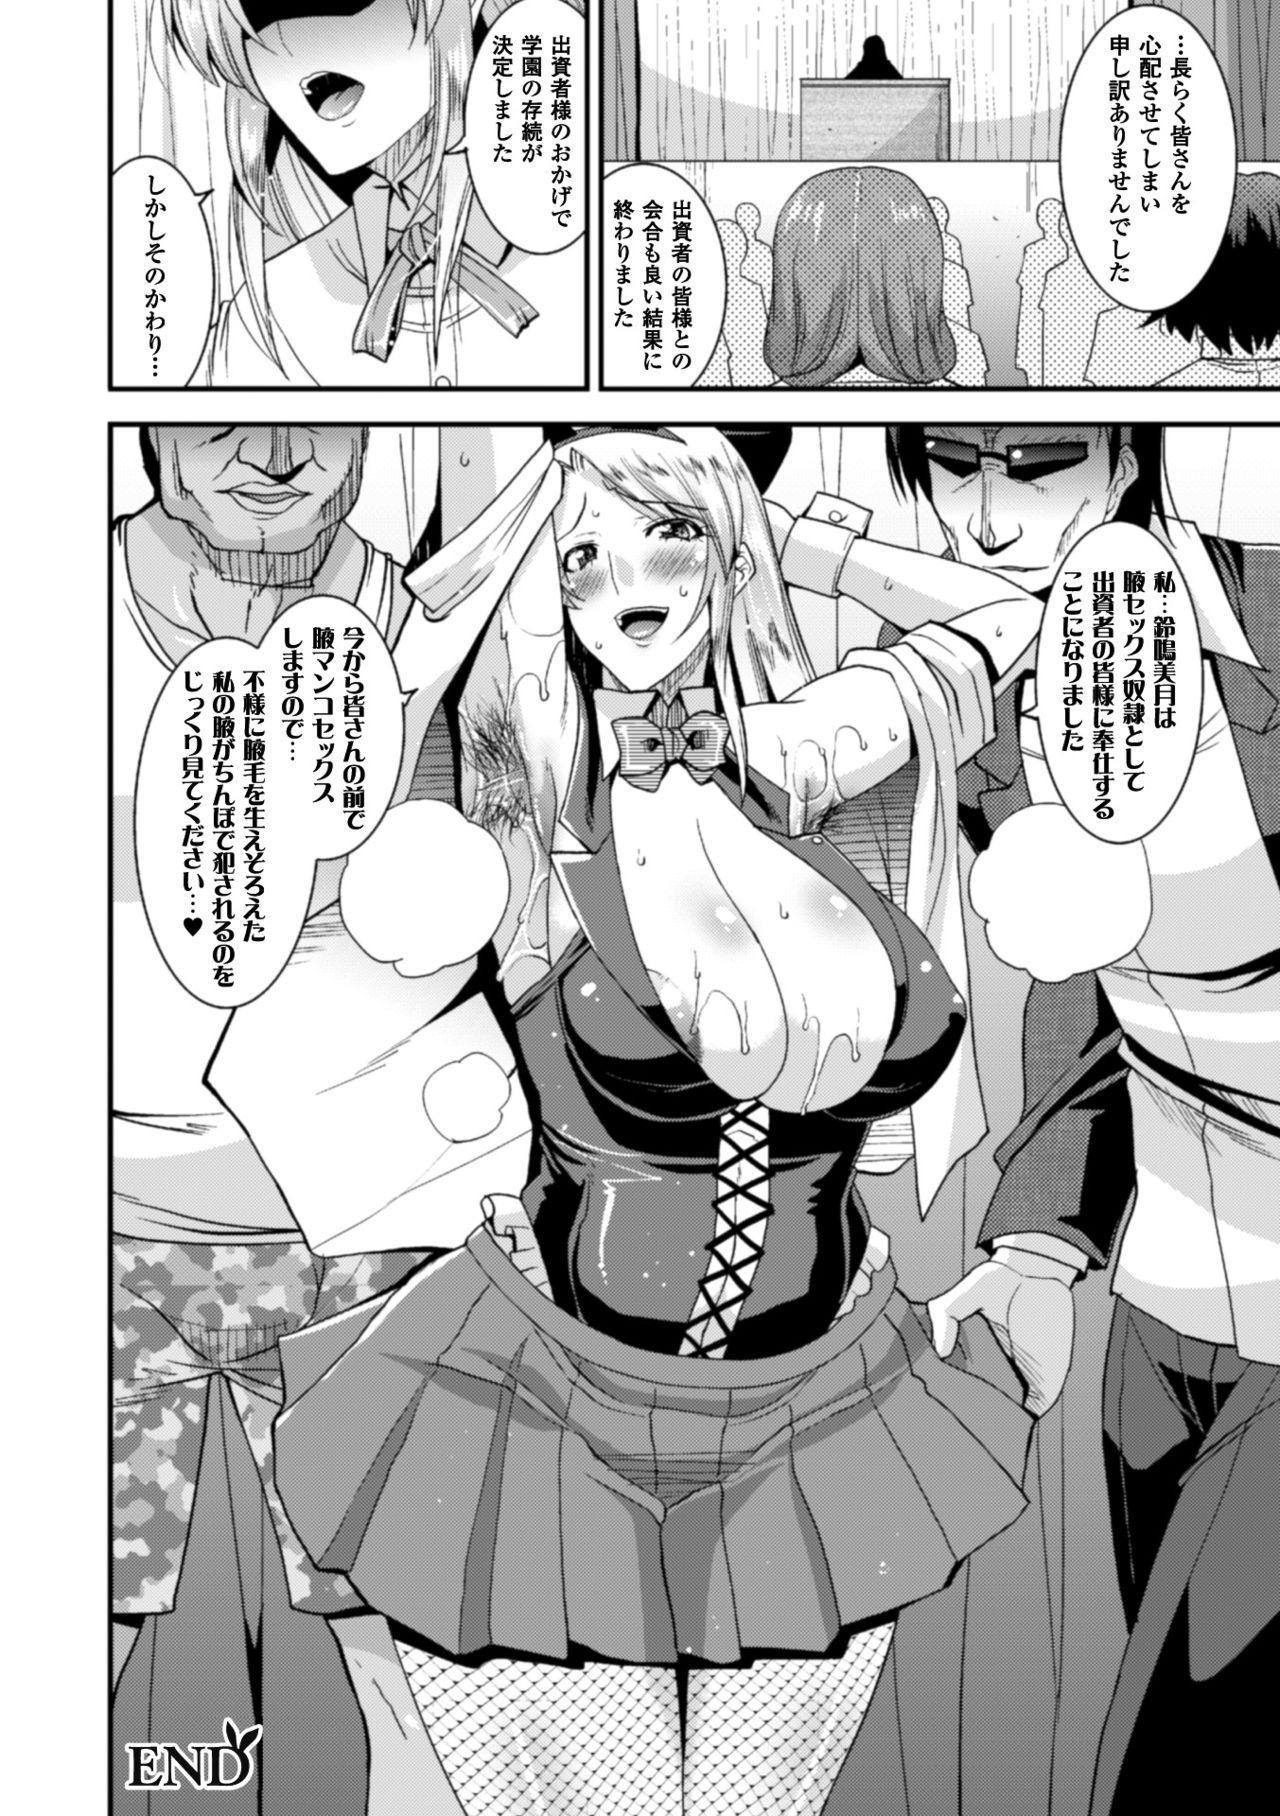 2D Comic Magazine Waki Feti Bunny Girl Vol. 1 65